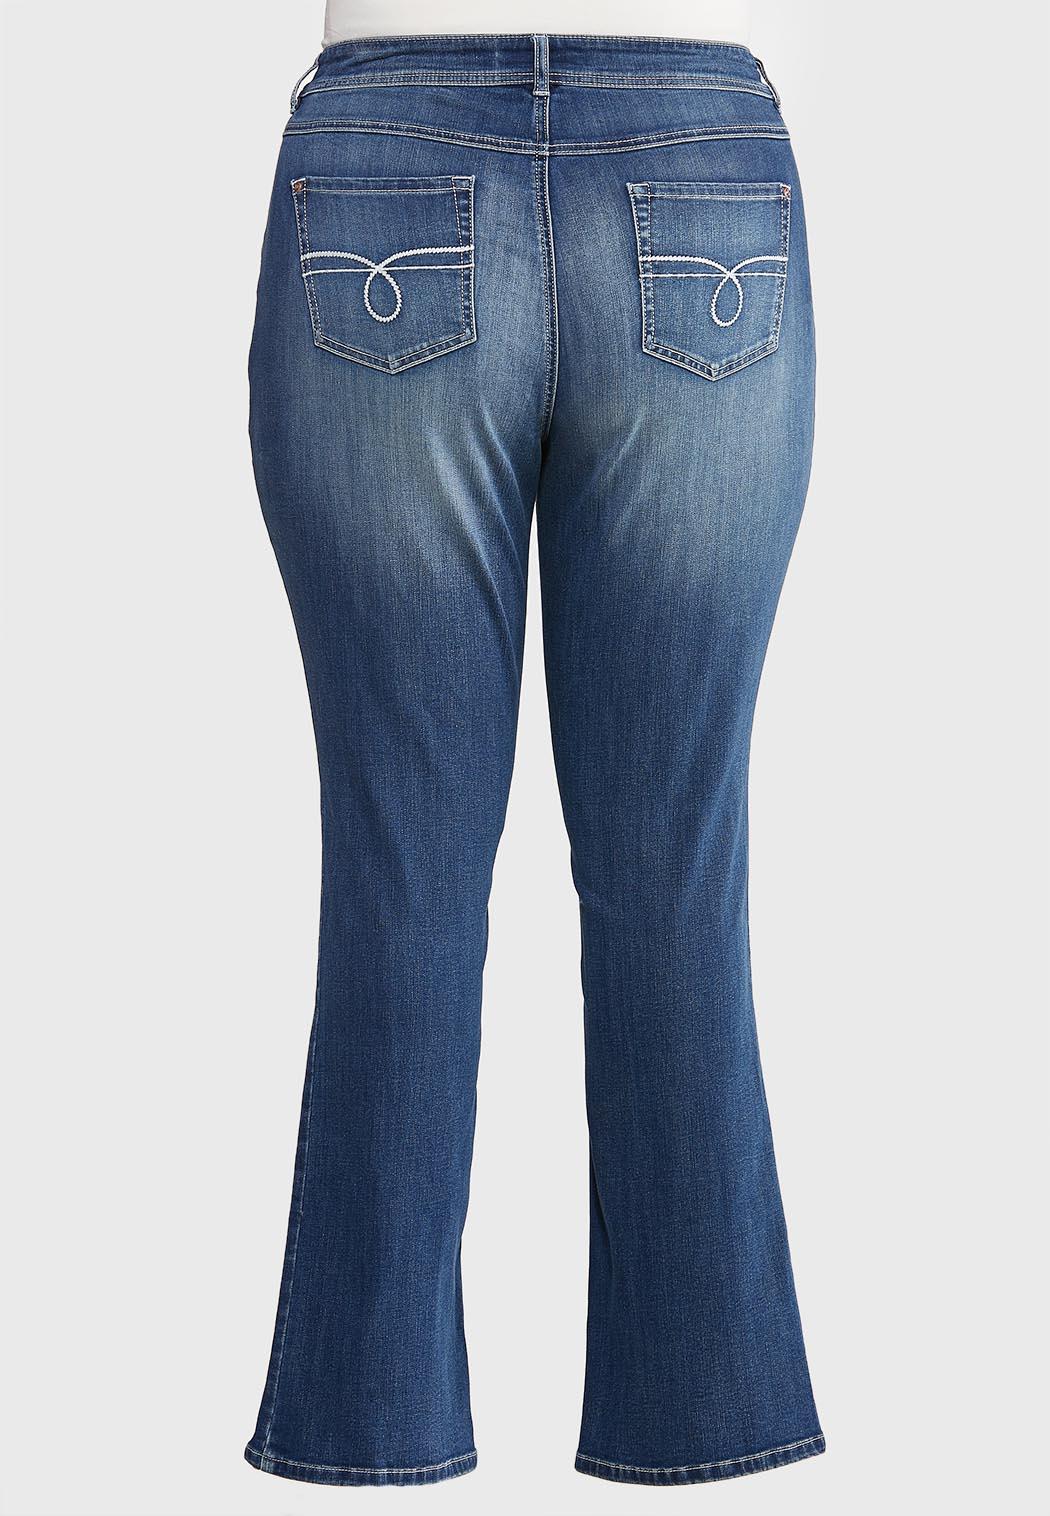 Plus Petite Dark Wash Bootcut Jeans (Item #43929417)